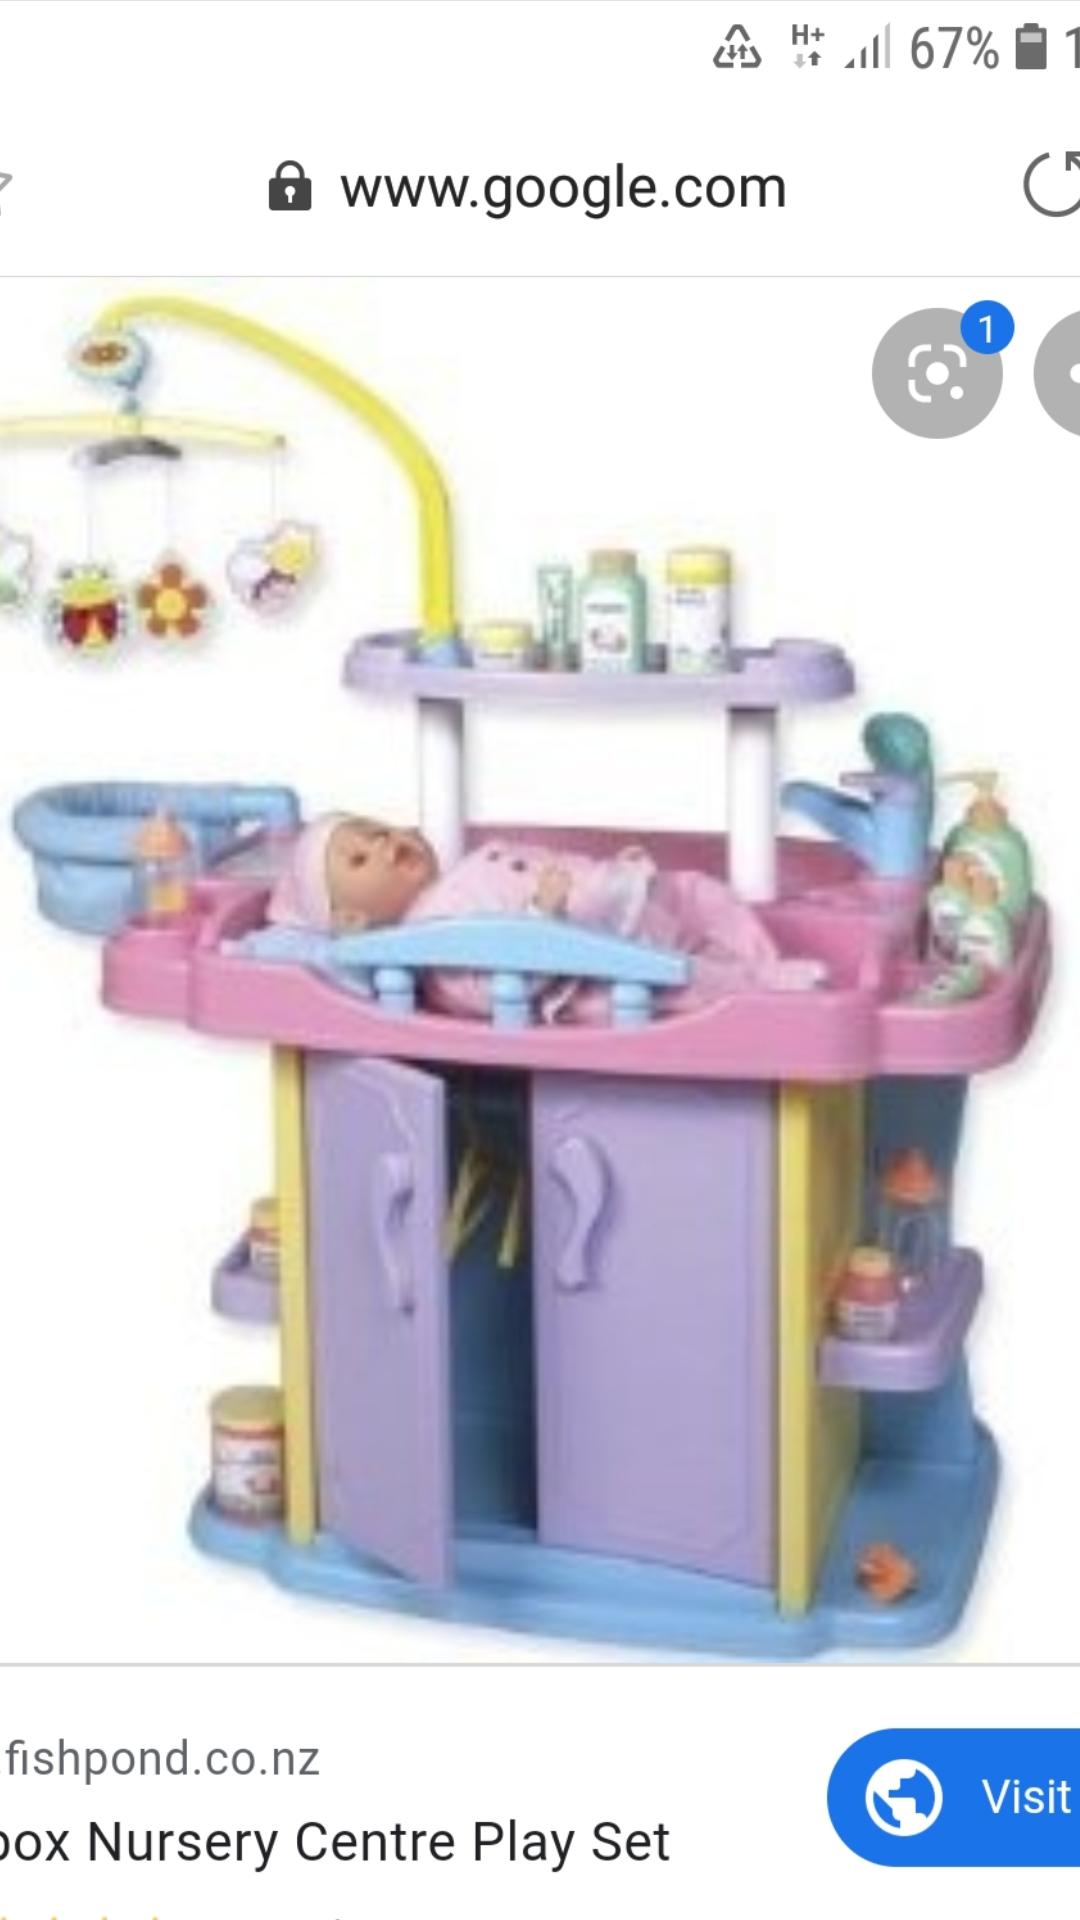 Redbox Nursery Center and accessories